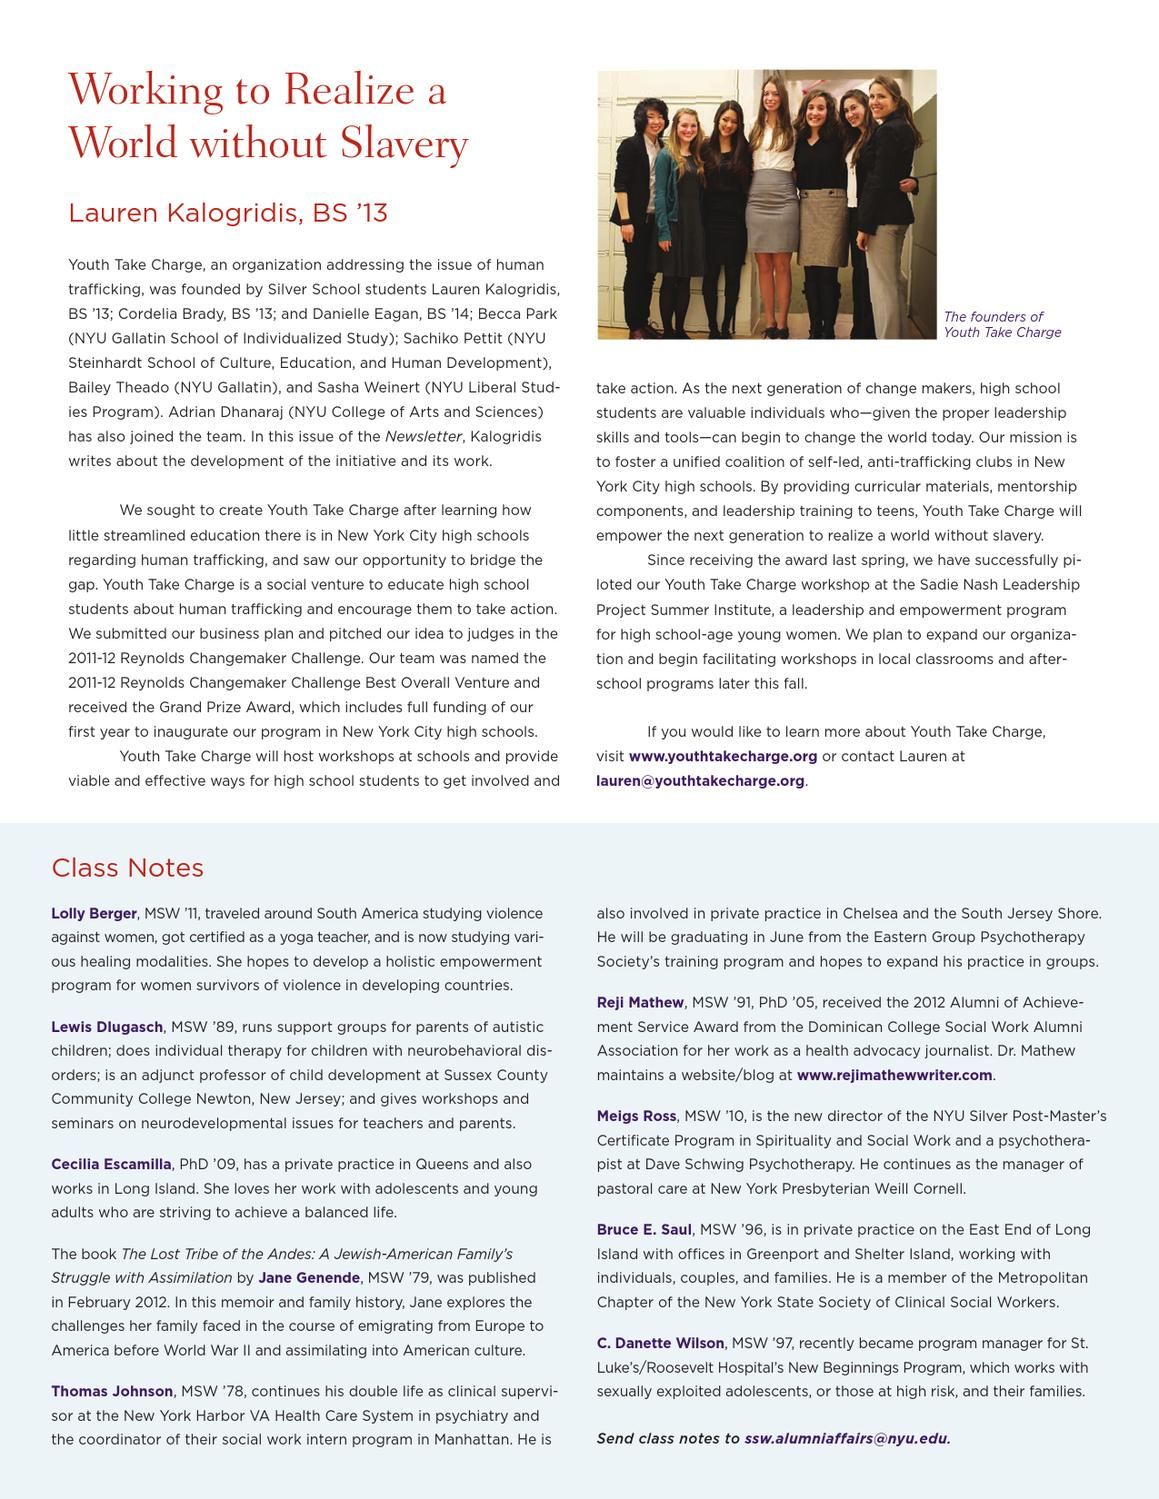 Nyu Silver Fall 2012 Newsletter By Nyu Silver School Of Social Work